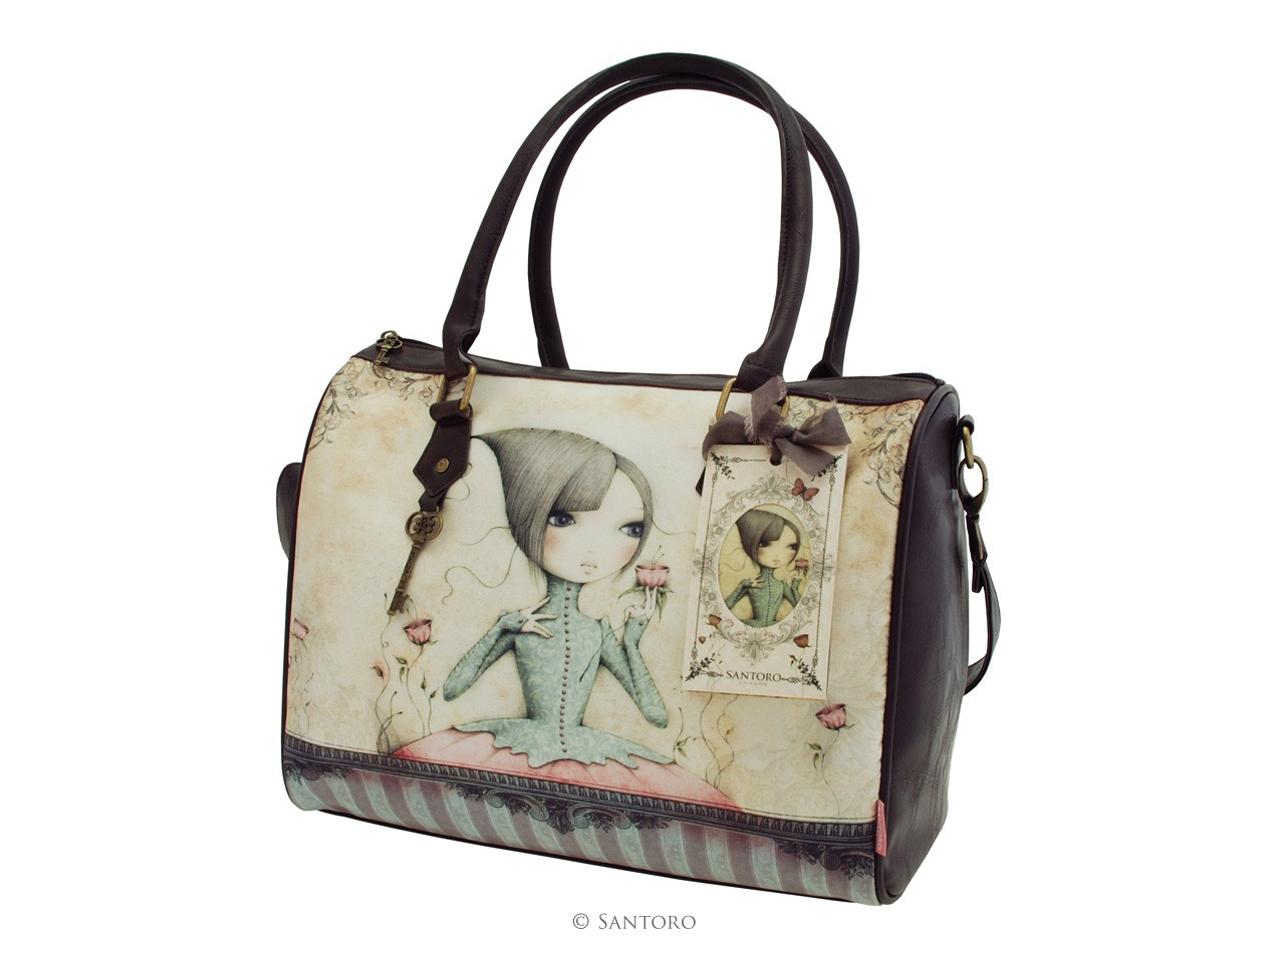 Santoro Mirabelle Handbag Shoulder Bag If Only